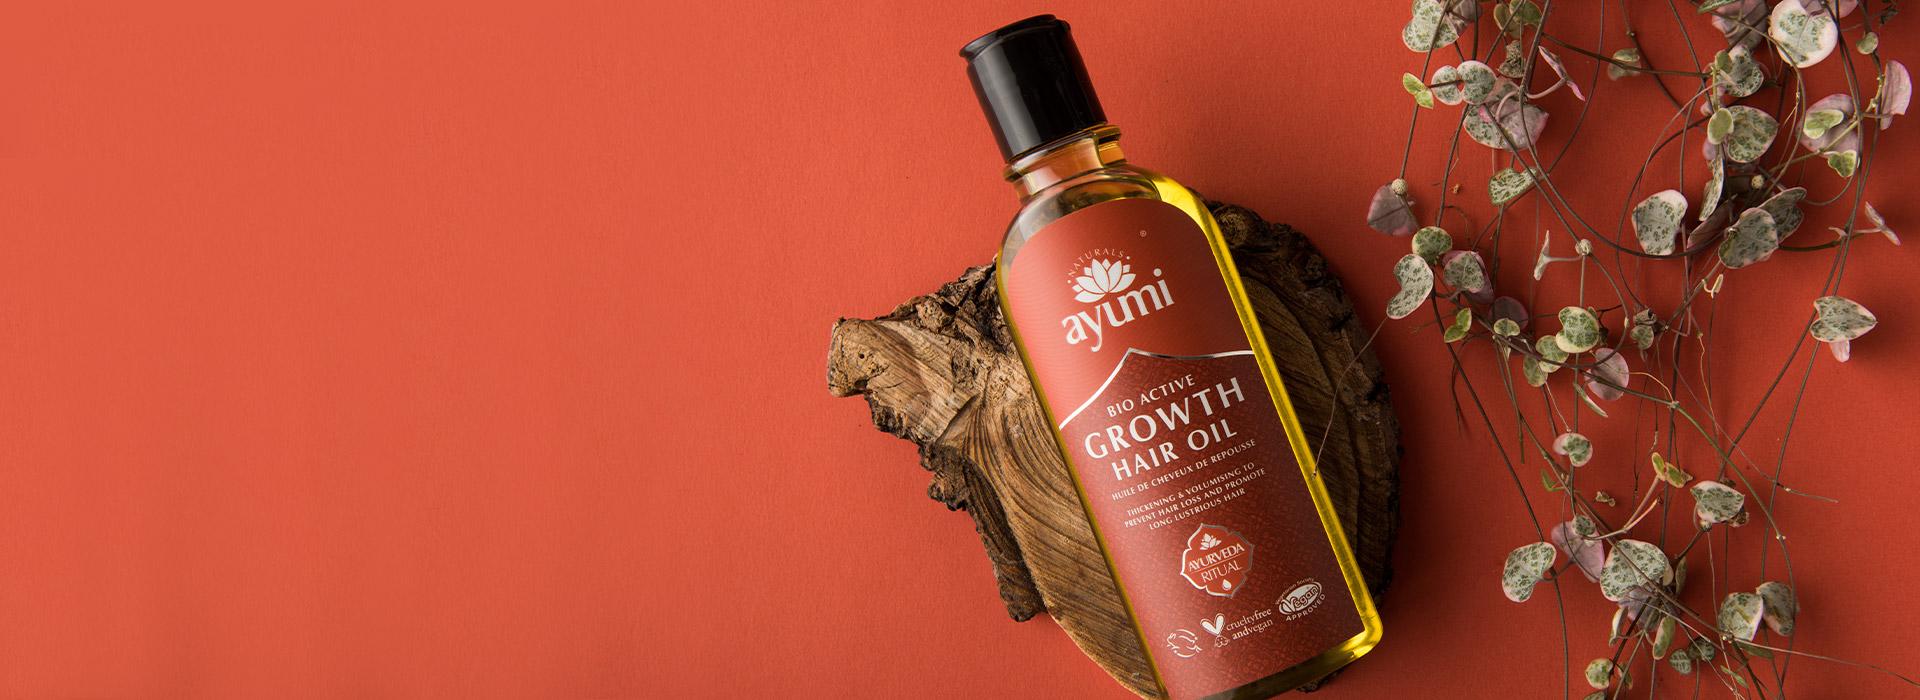 Homepage Image of Ayumi Hair Growth Oil